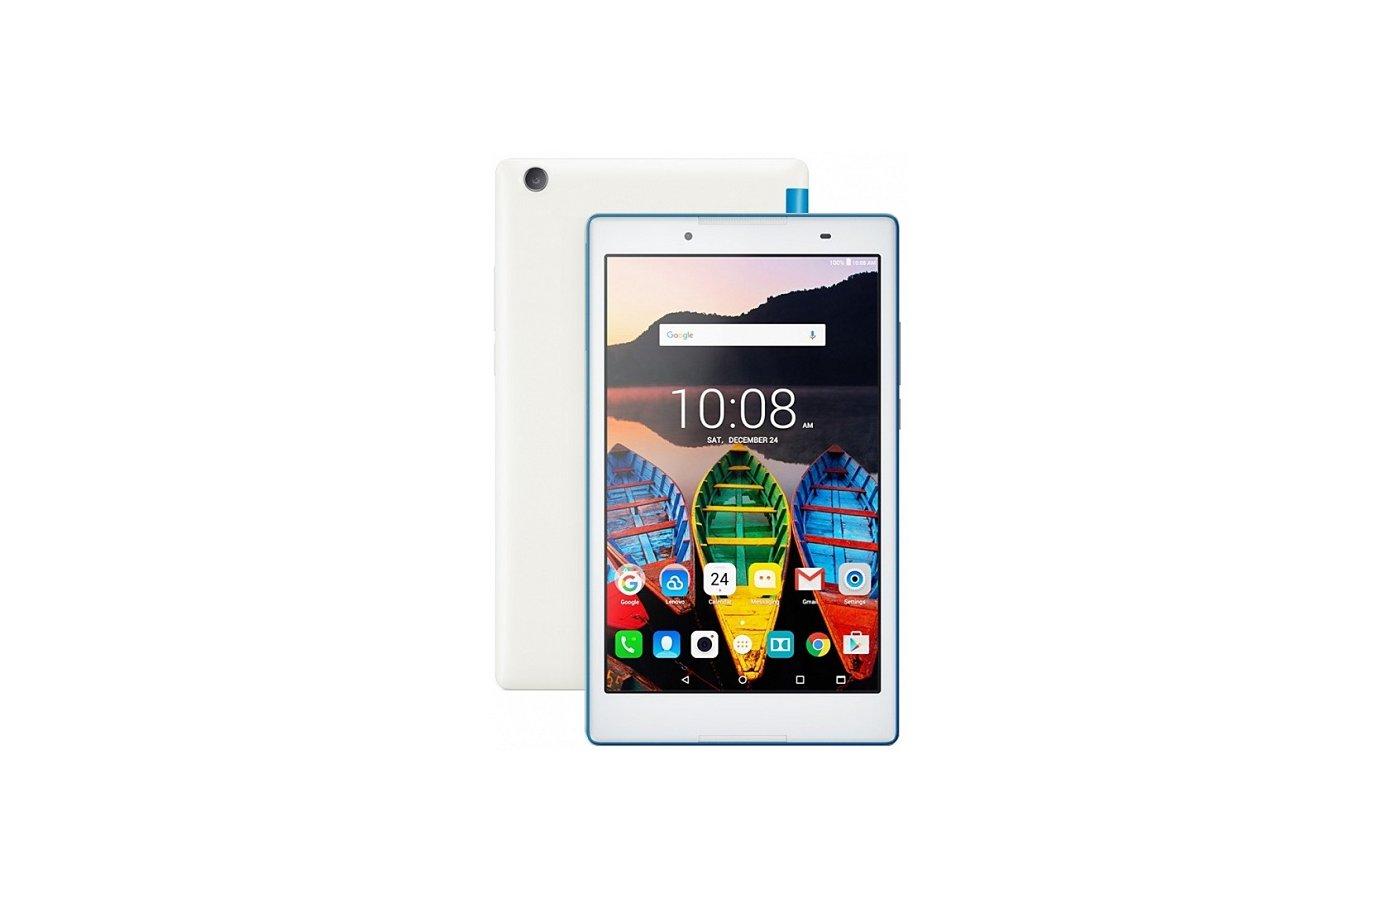 Планшет Lenovo Tab 3 TB3-850M (8.0) IPS 16Gb/3G/LTE/White /ZA180028RU/